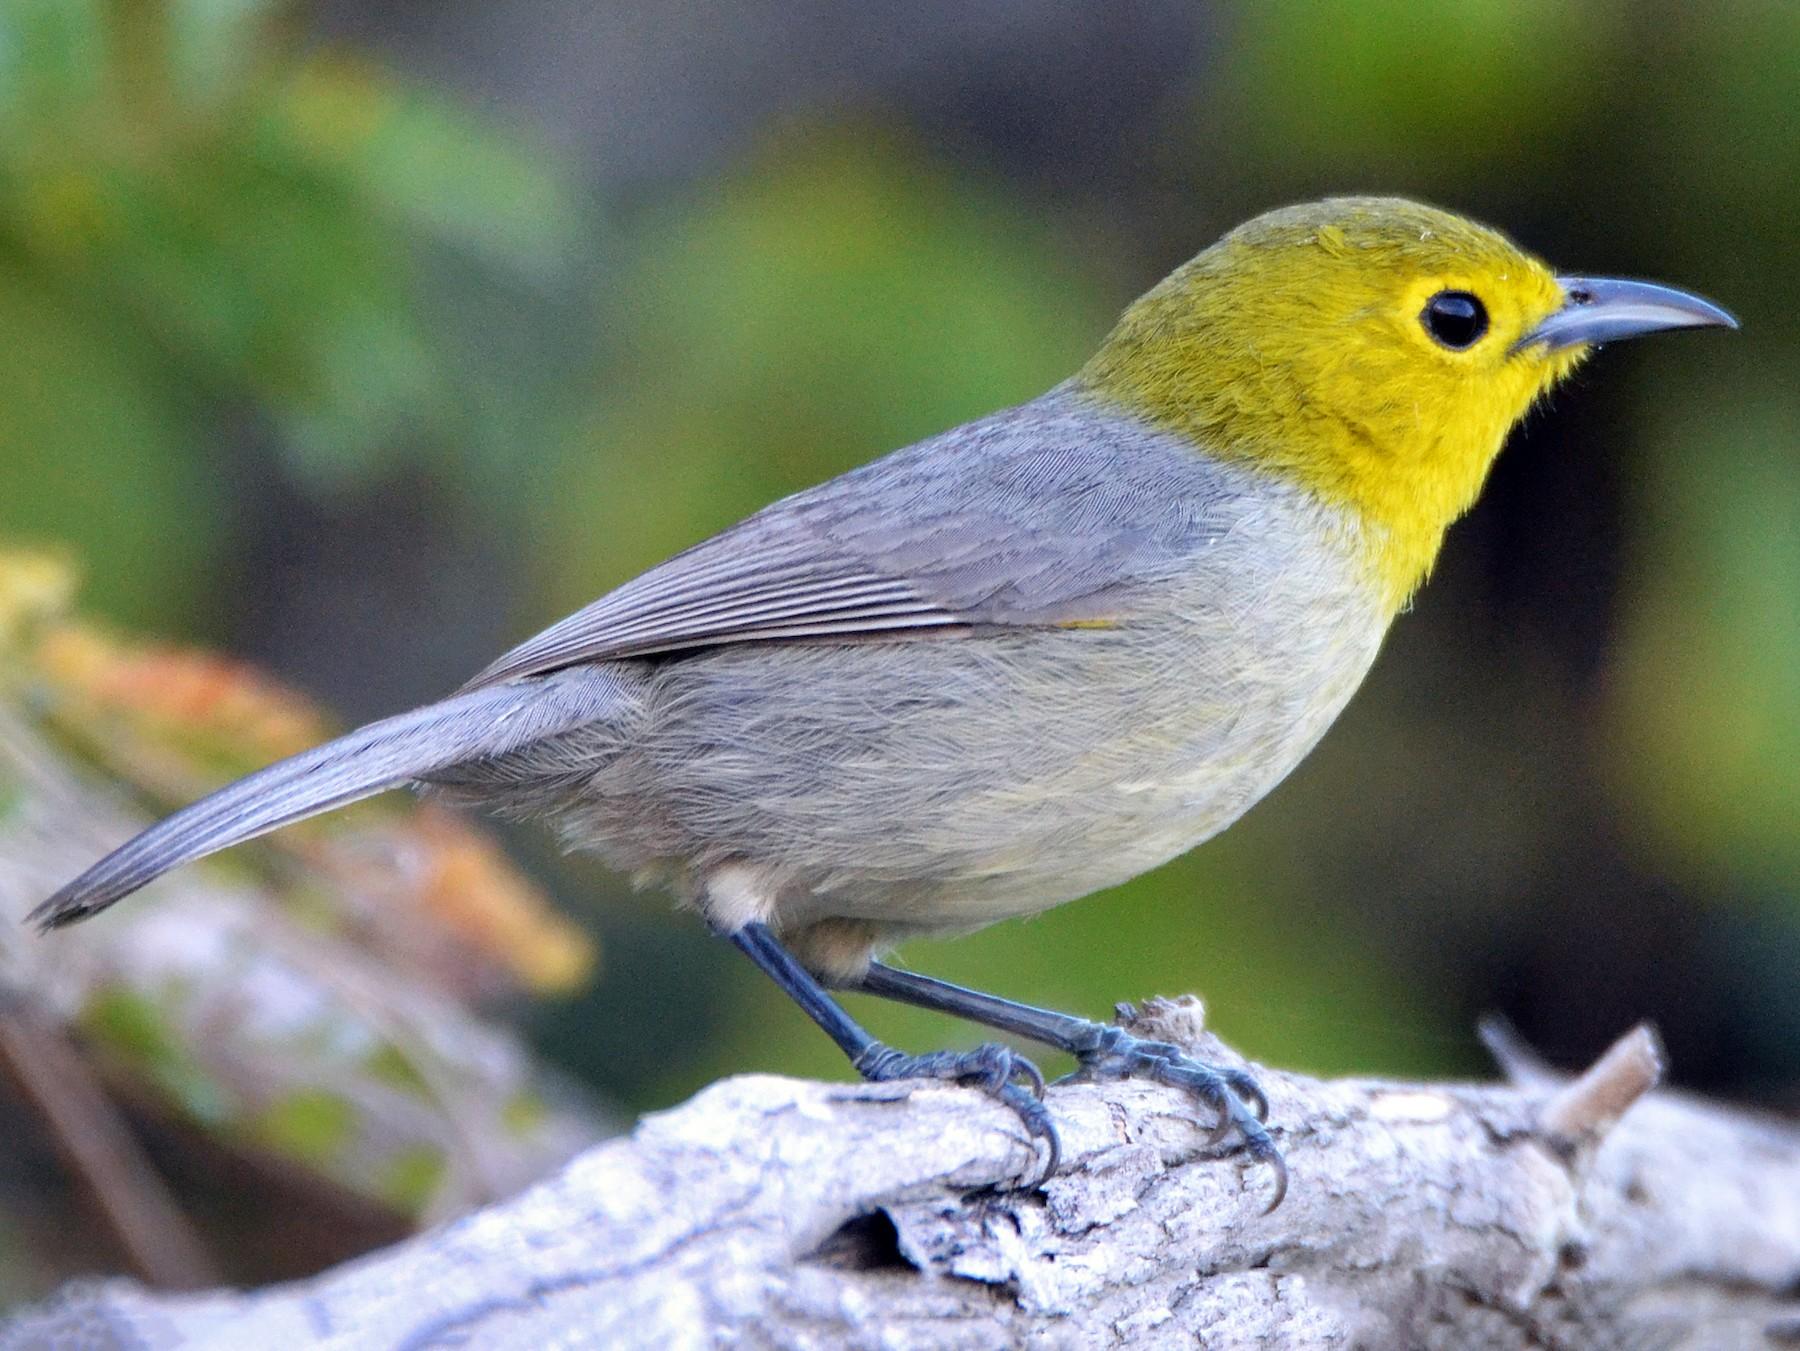 Yellow-headed Warbler - Michael J Good